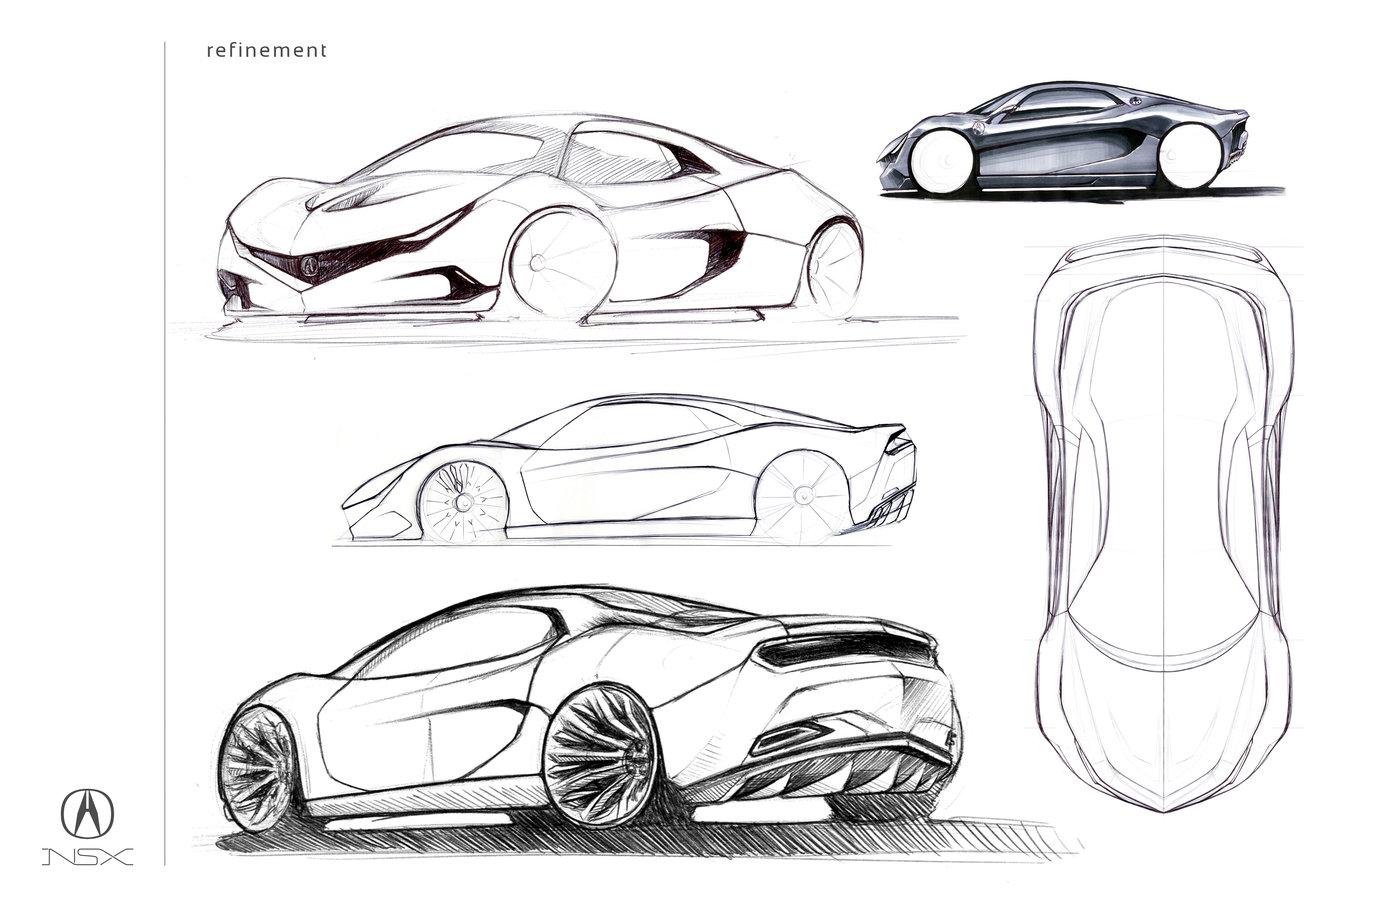 2020 nsx concept by jake bosnak at coroflot com